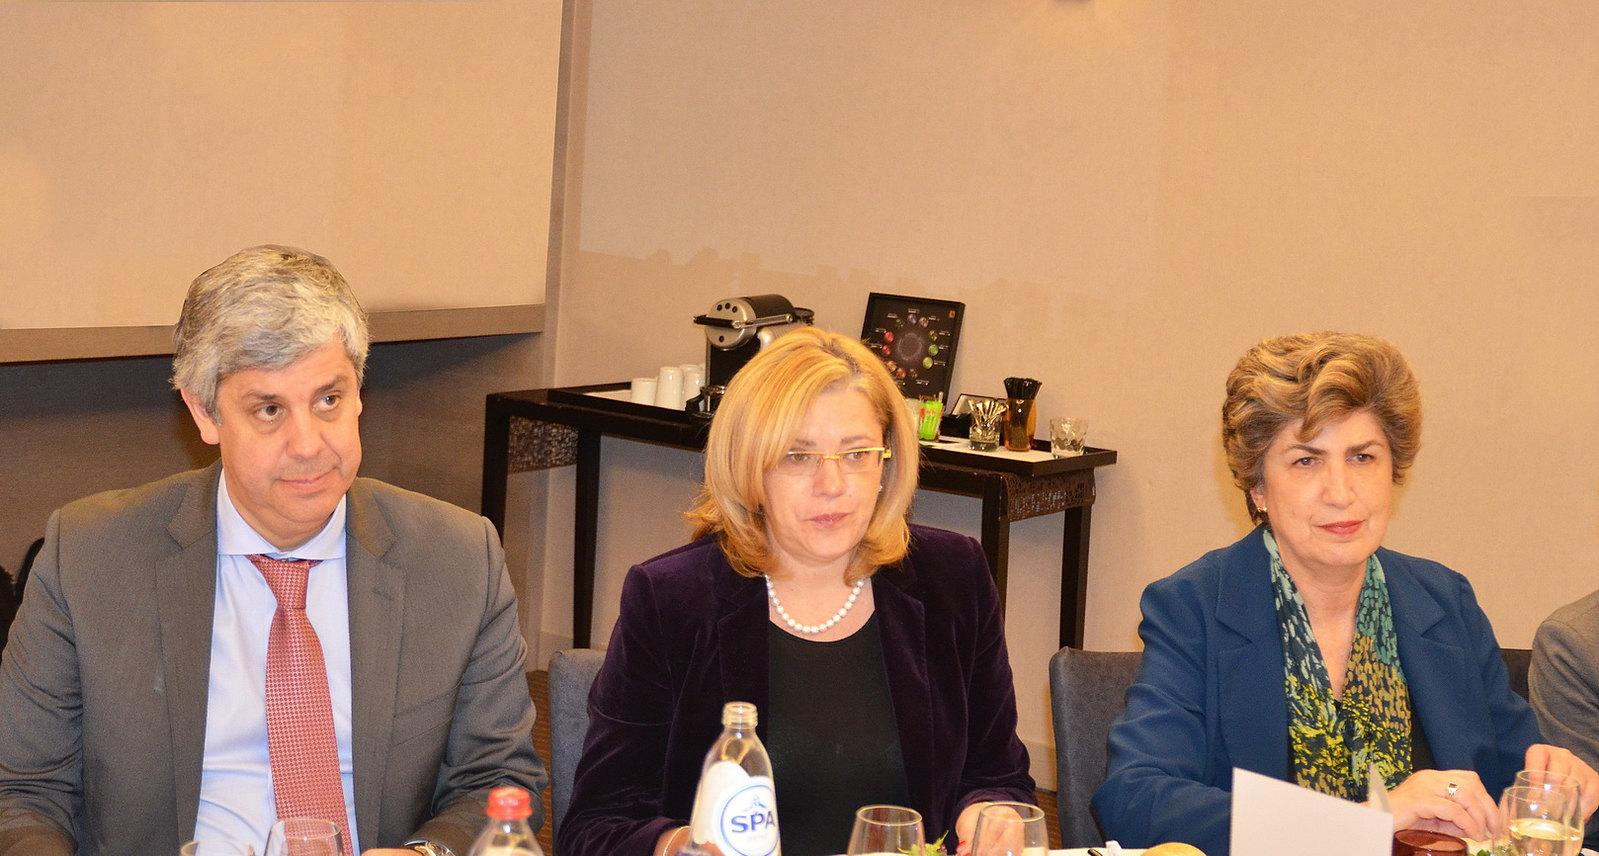 PES ECOFIN meeting, 19 February 2018